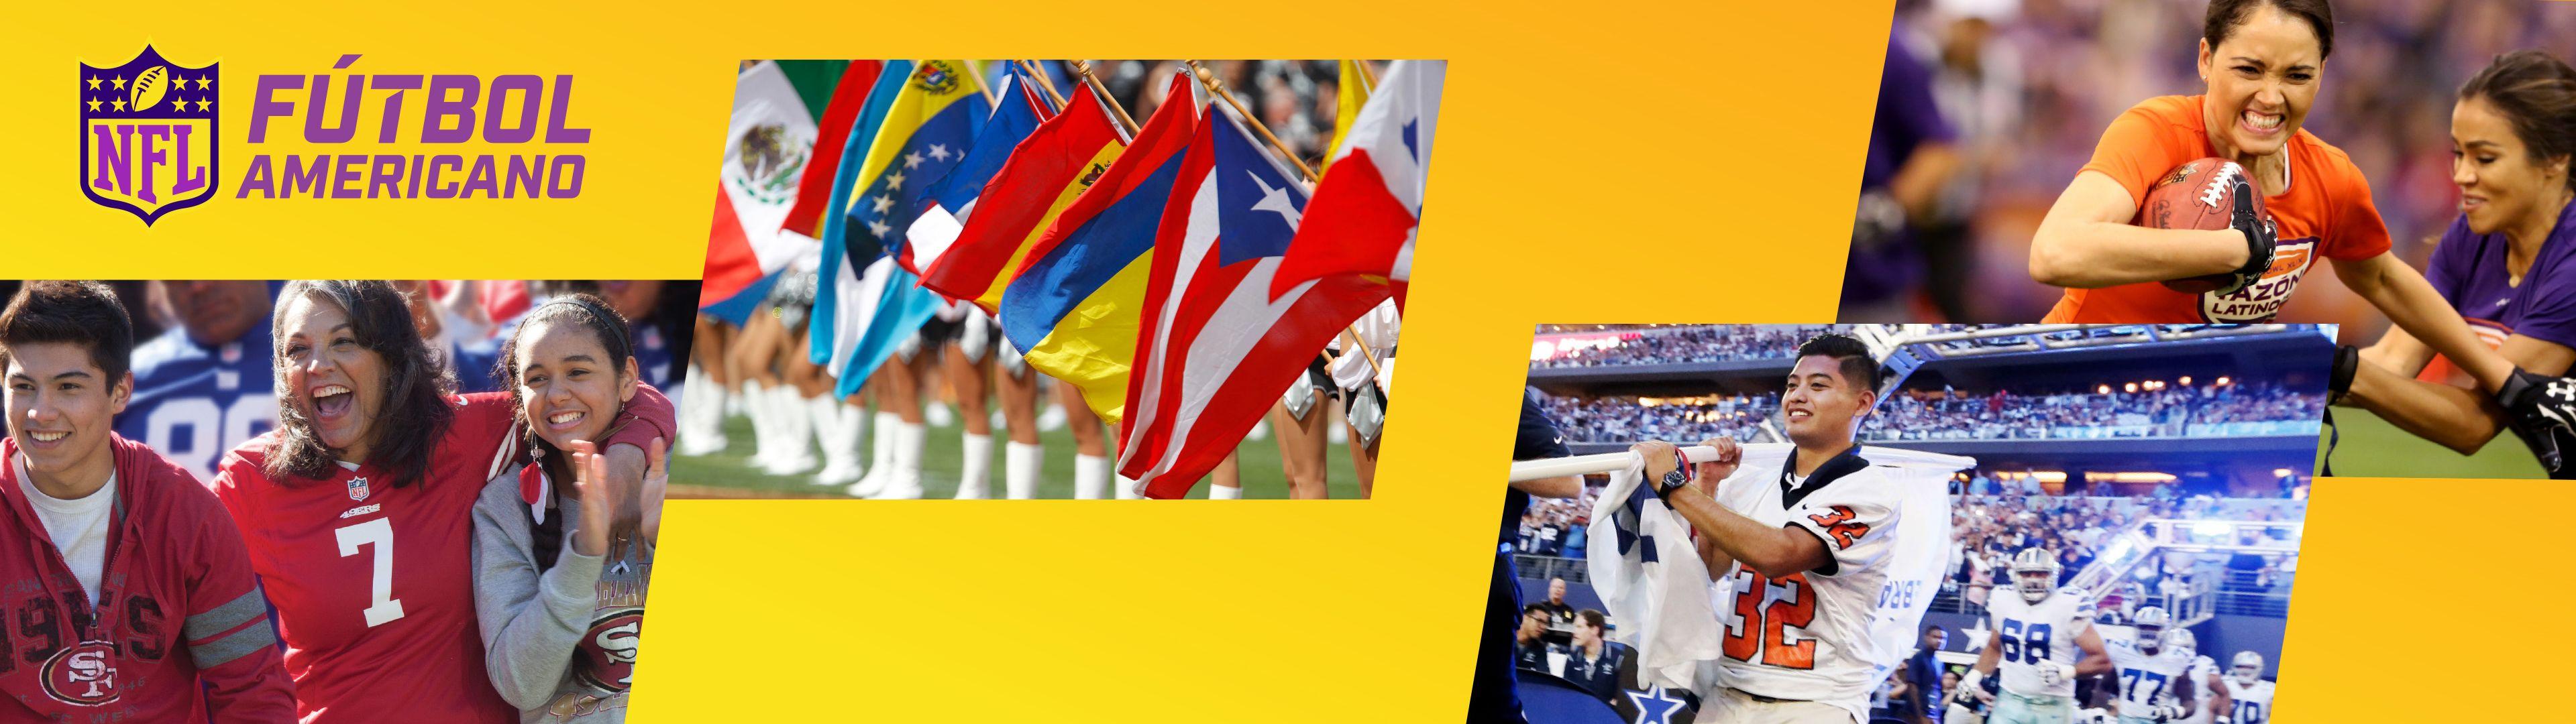 FutbolAmericano_Masthead2 (1)